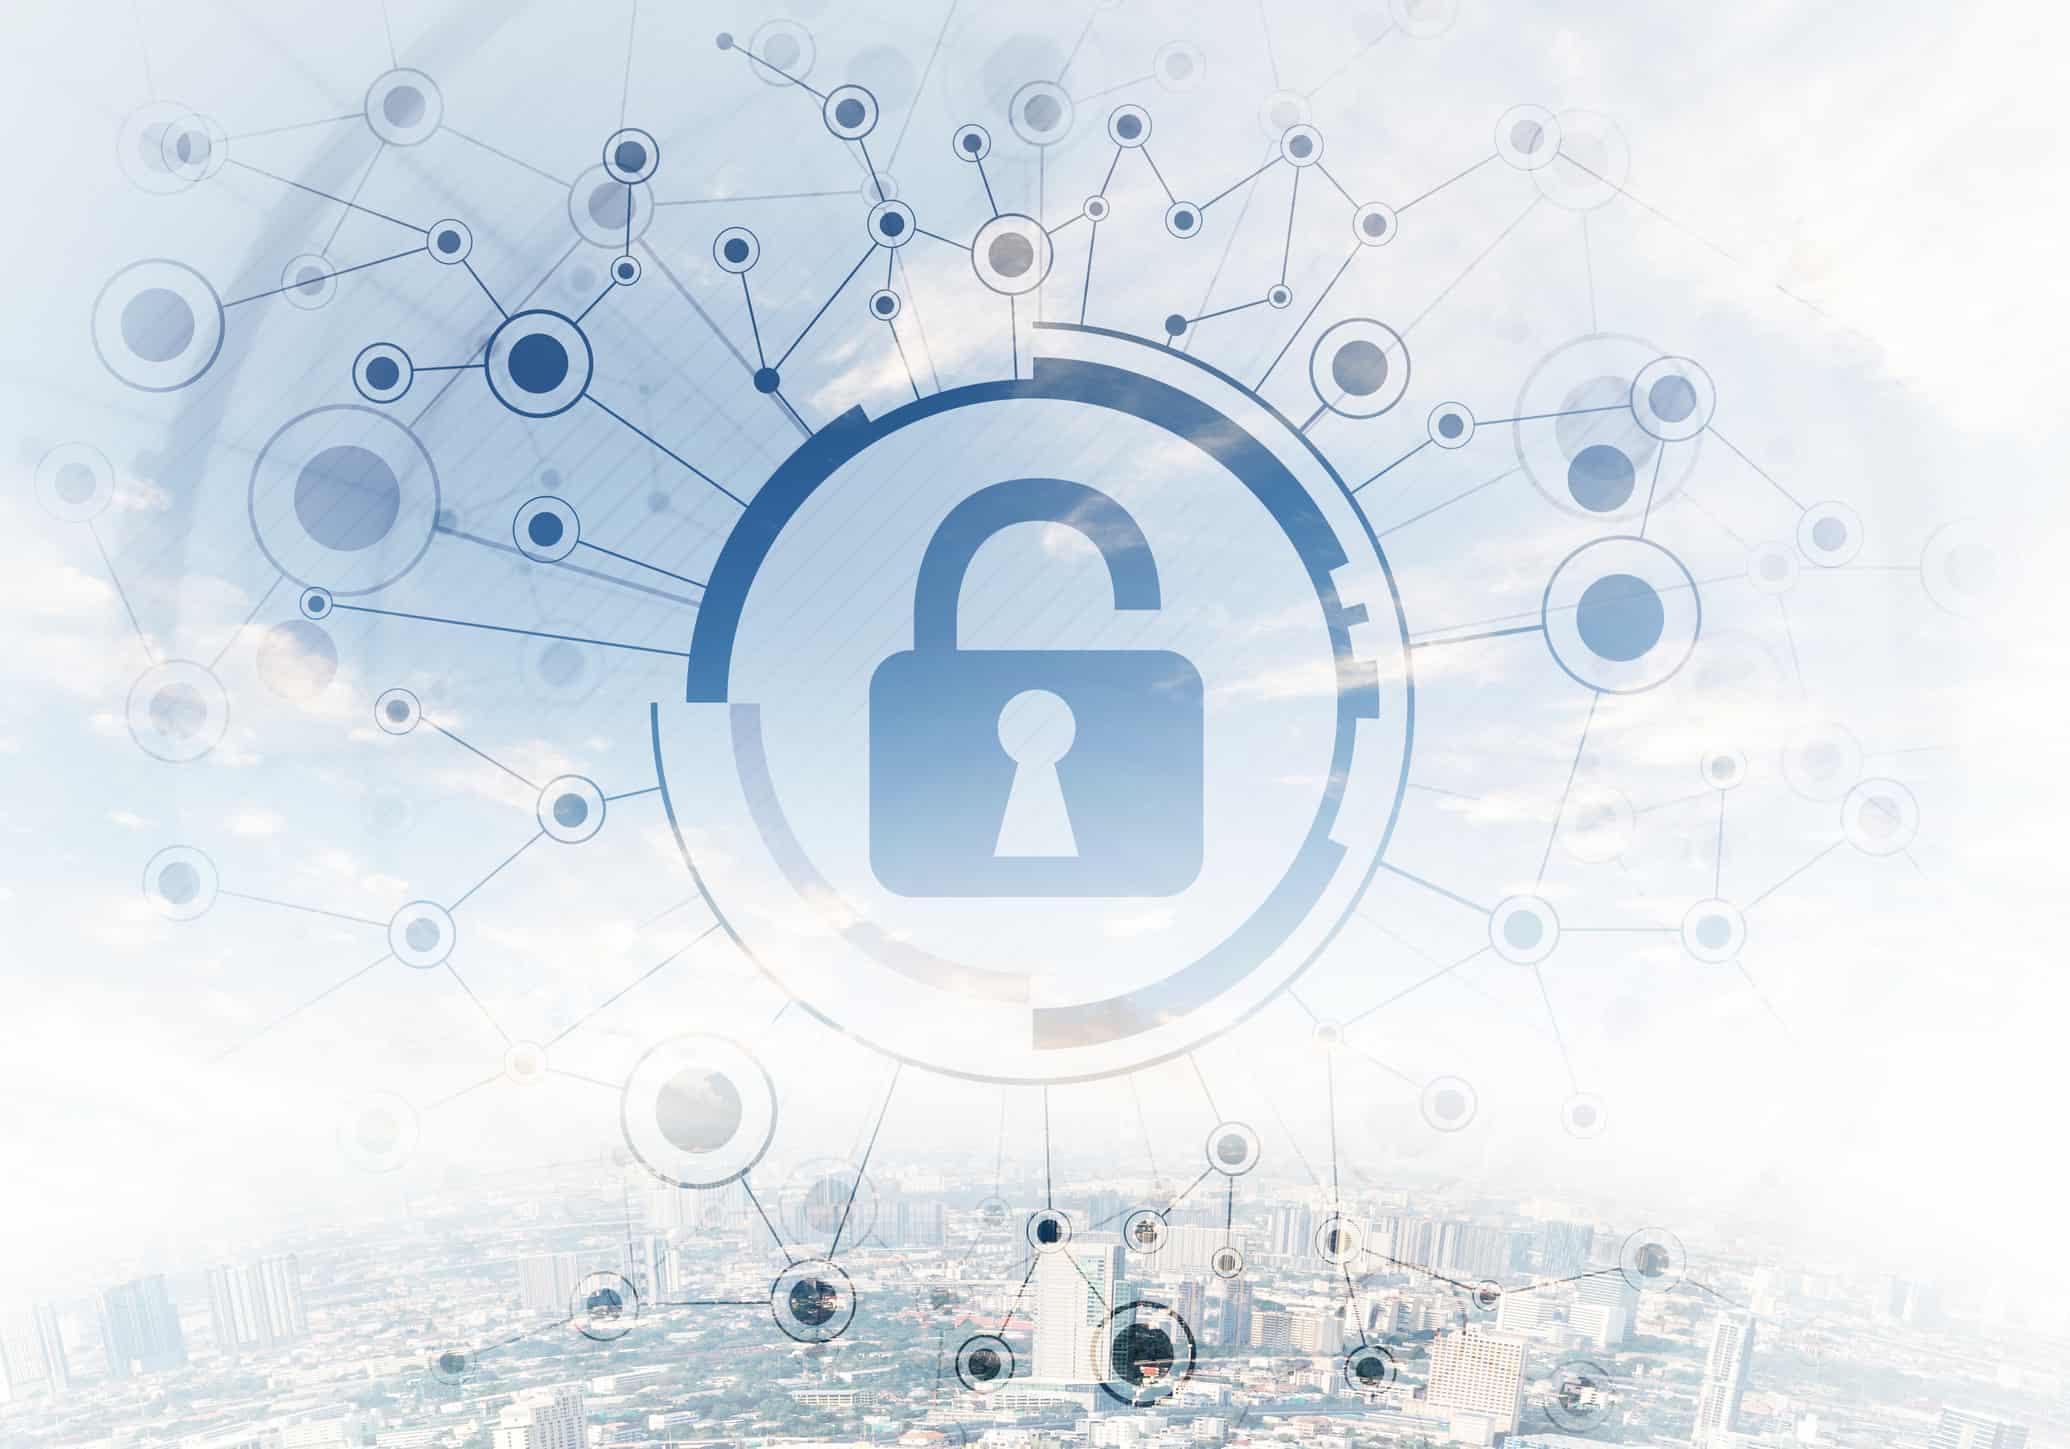 NIST 800-53 compliance